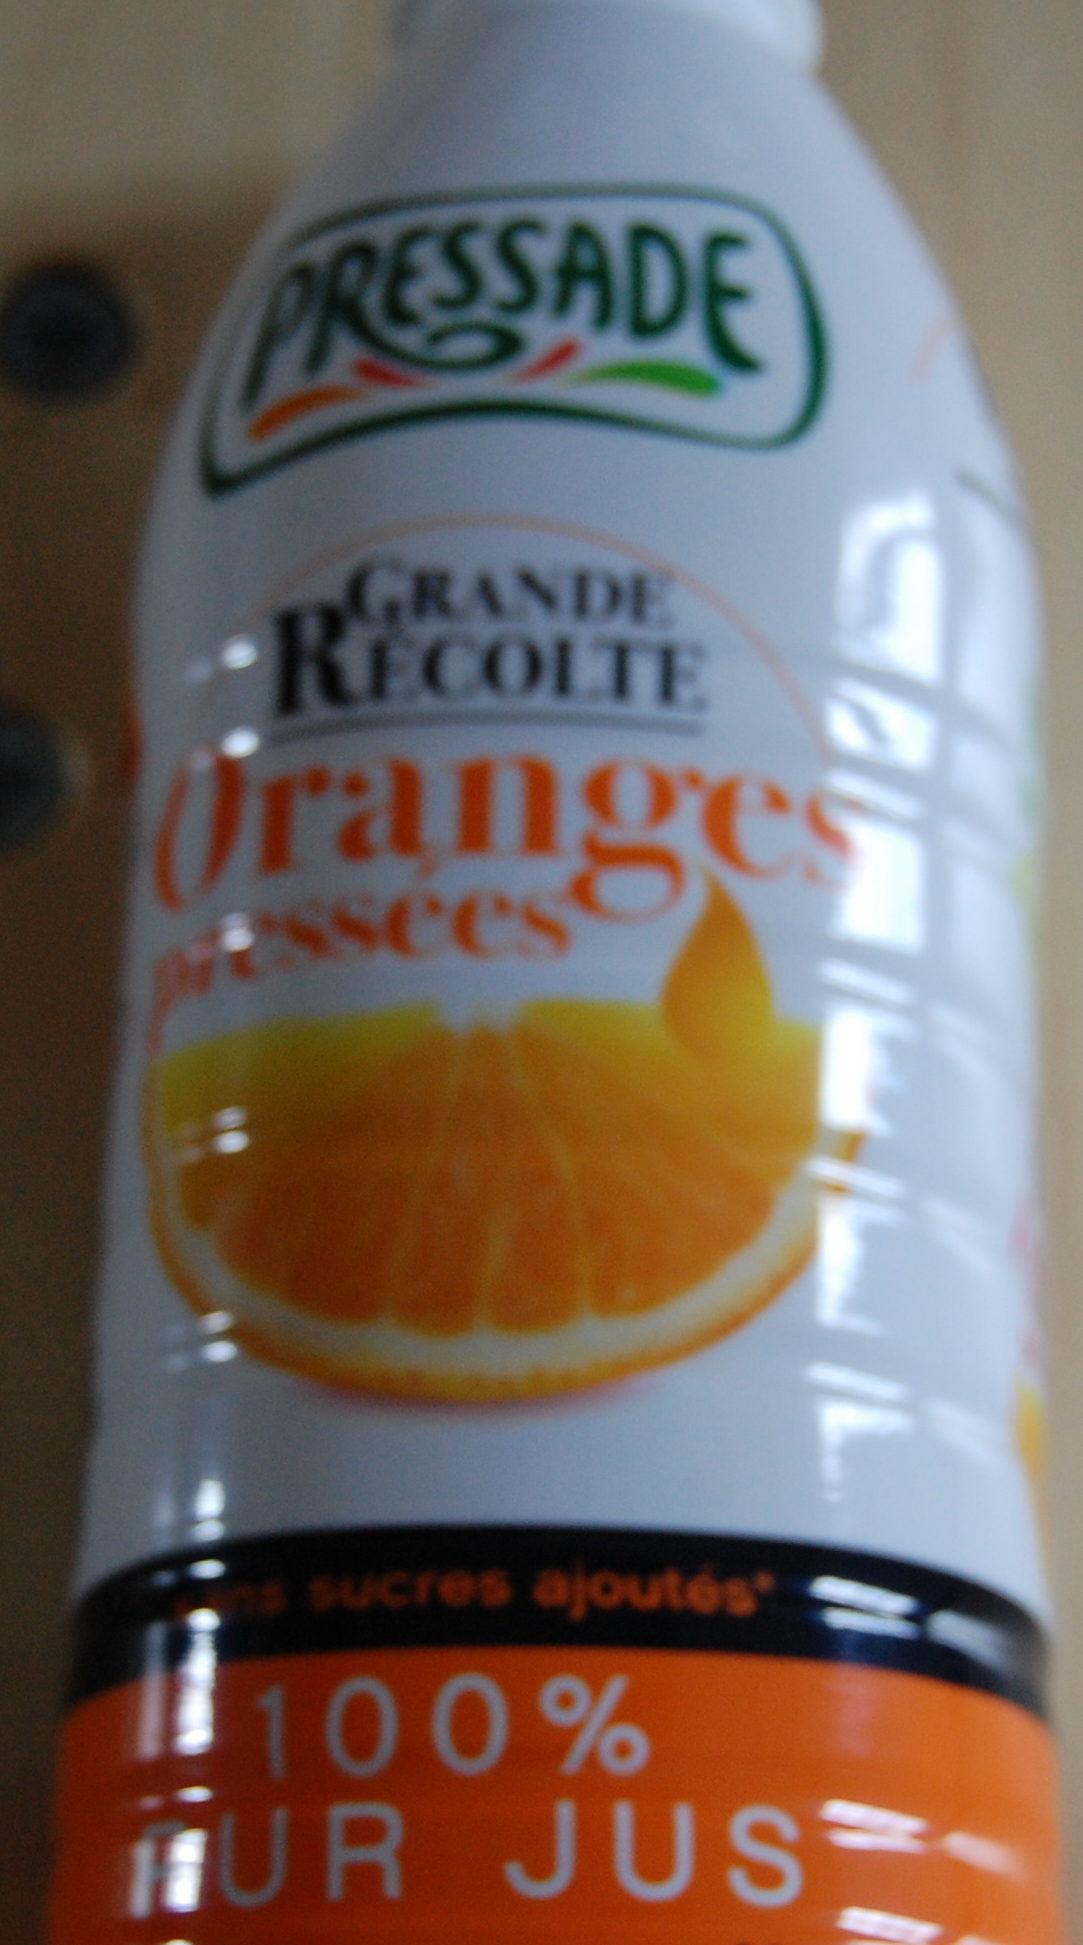 Oranges pressées Grande Récolte - Ingrediënten - fr